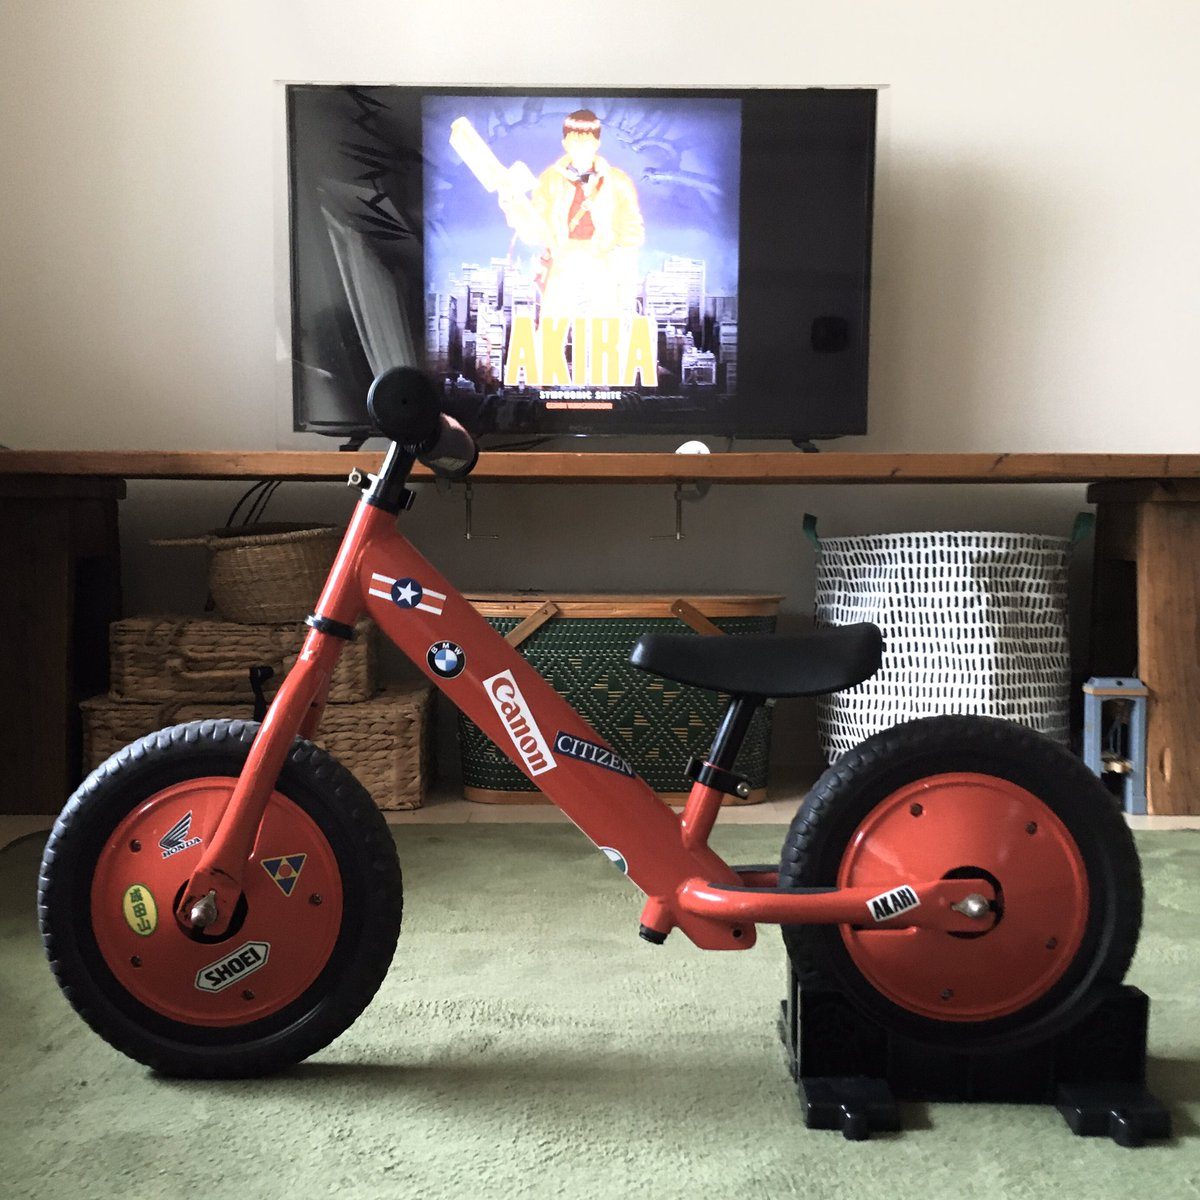 AKIRA「金田のバイク」ストライダーバージョンできた。2歳の息子にはピーキー過ぎるかもしれん。